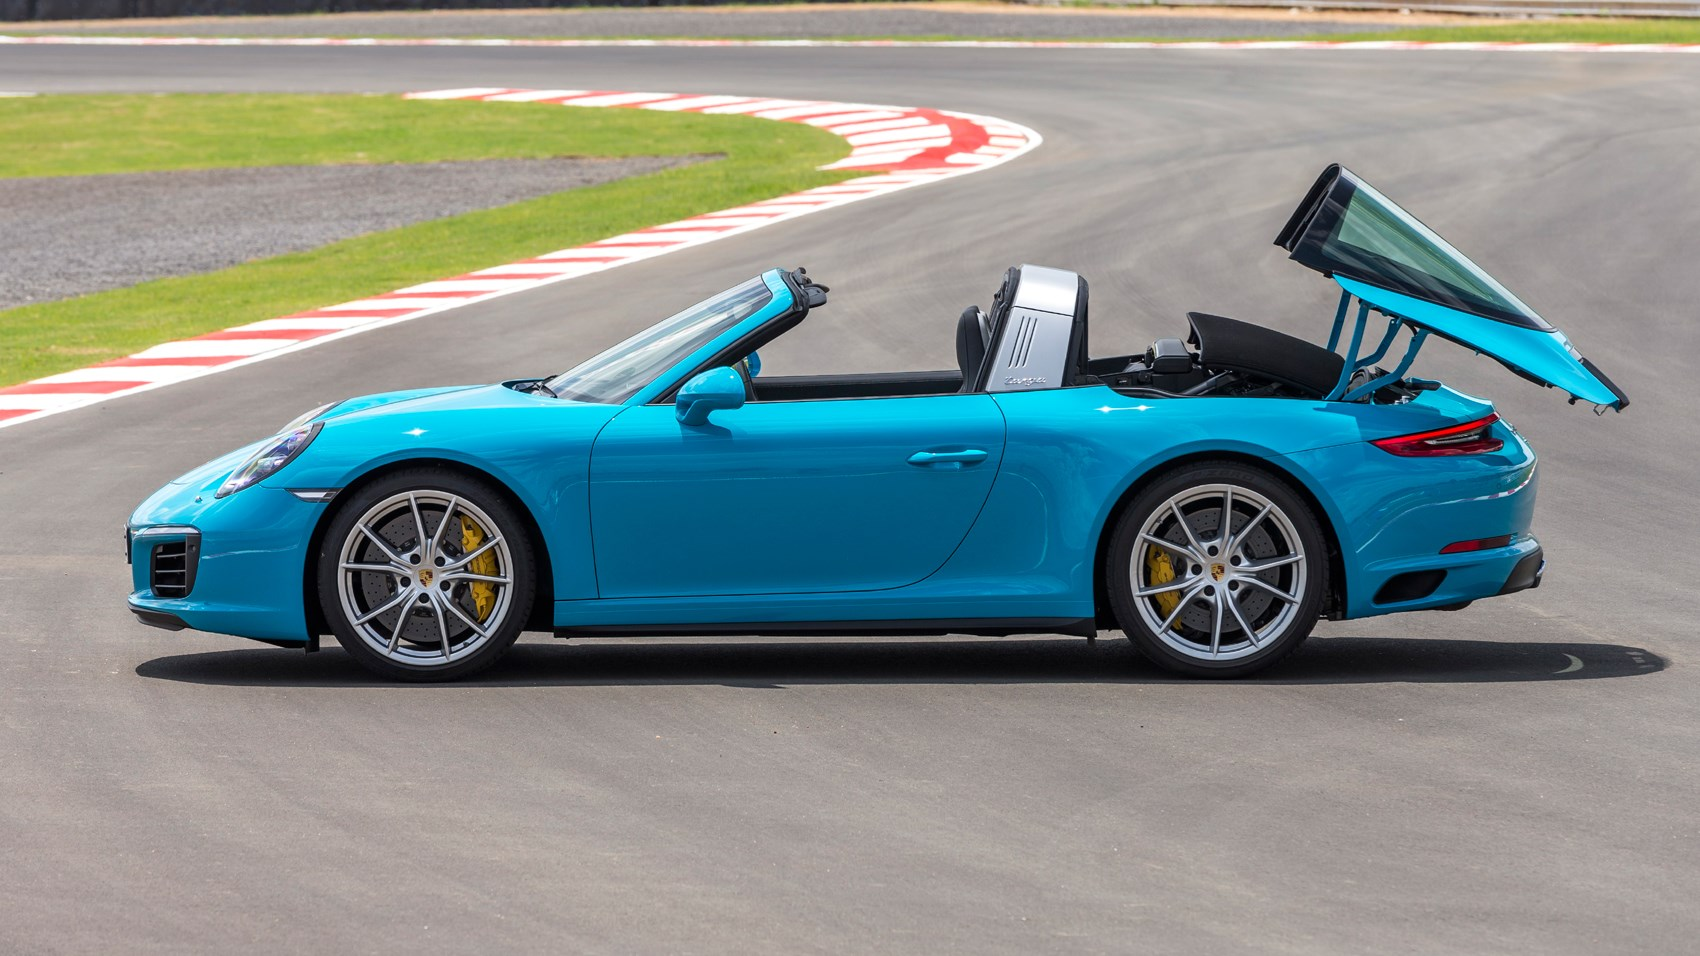 Porsche 911 targa 4 2016 review by car magazine